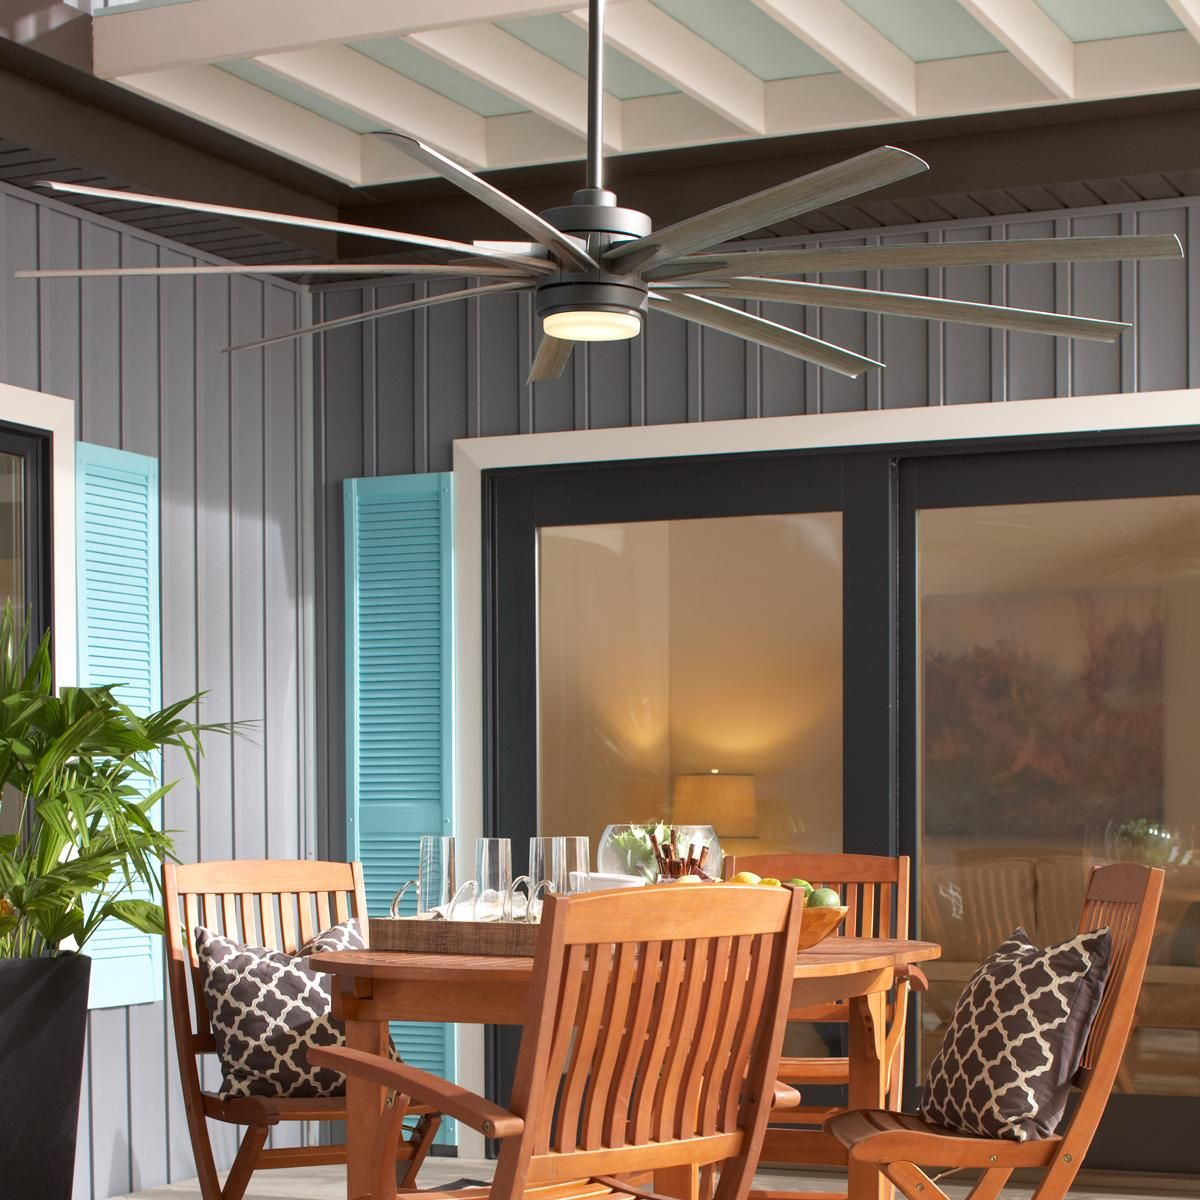 84 Indoor Outdoor Supersized Modern Ceiling Fan Outdoor Ceiling Fans Outdoor Fan Best Outdoor Ceiling Fans